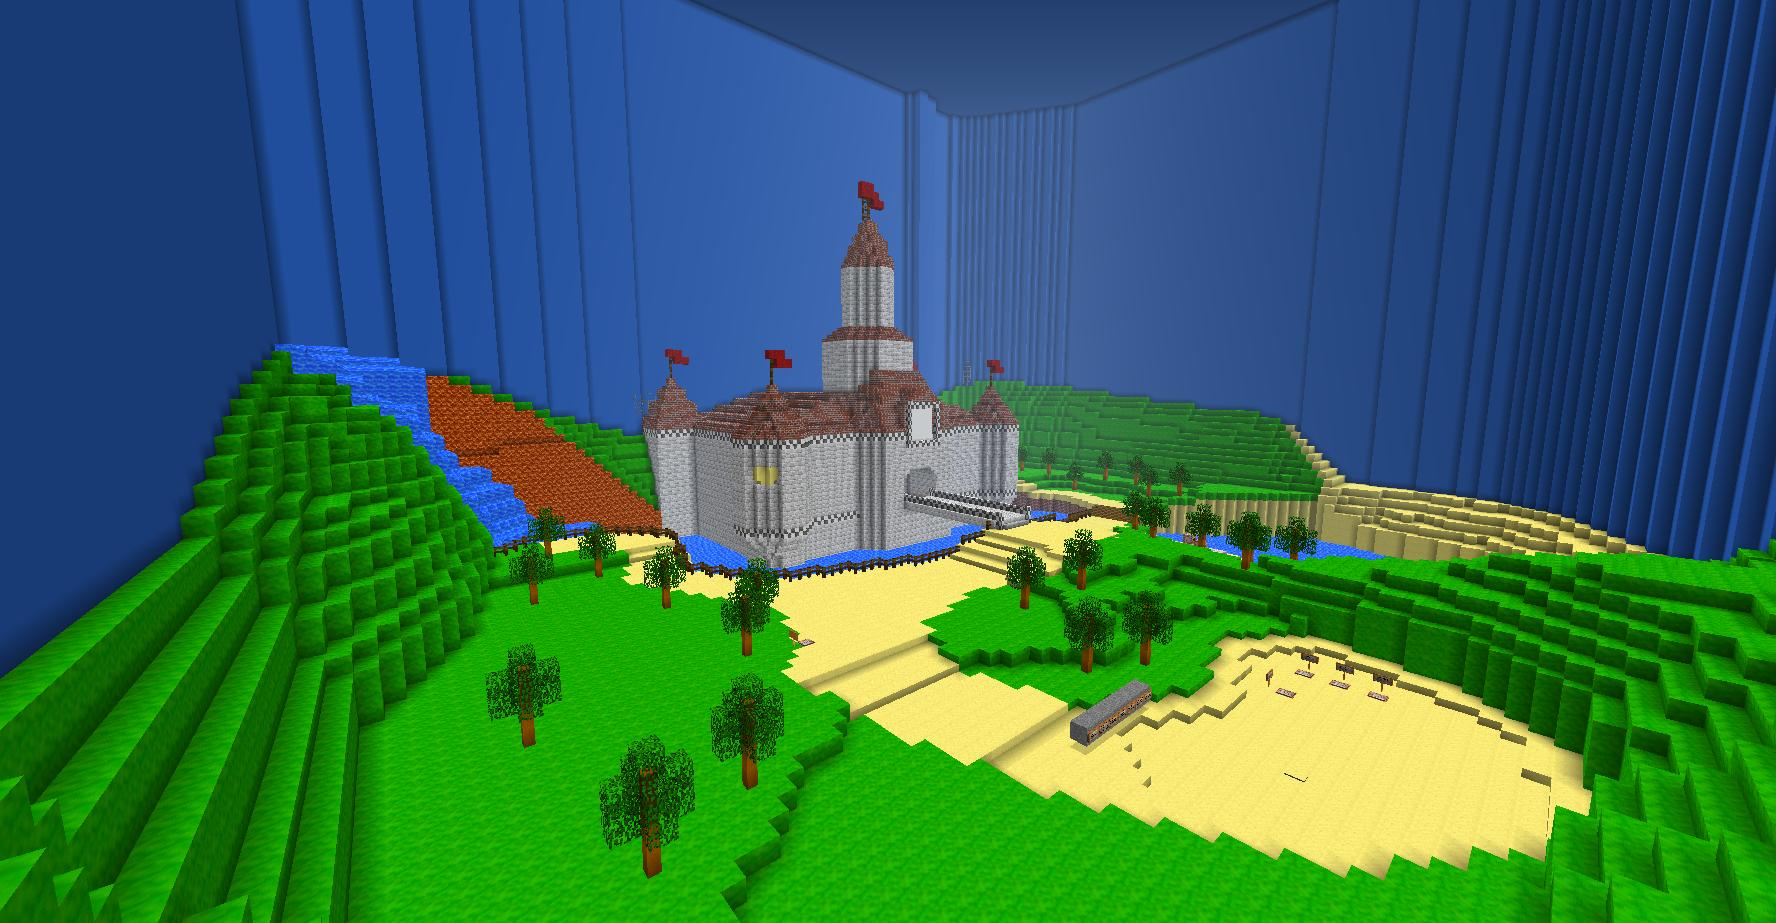 Mario 64 The Mushroom Castle 2 Minecraft Pixel Art Know